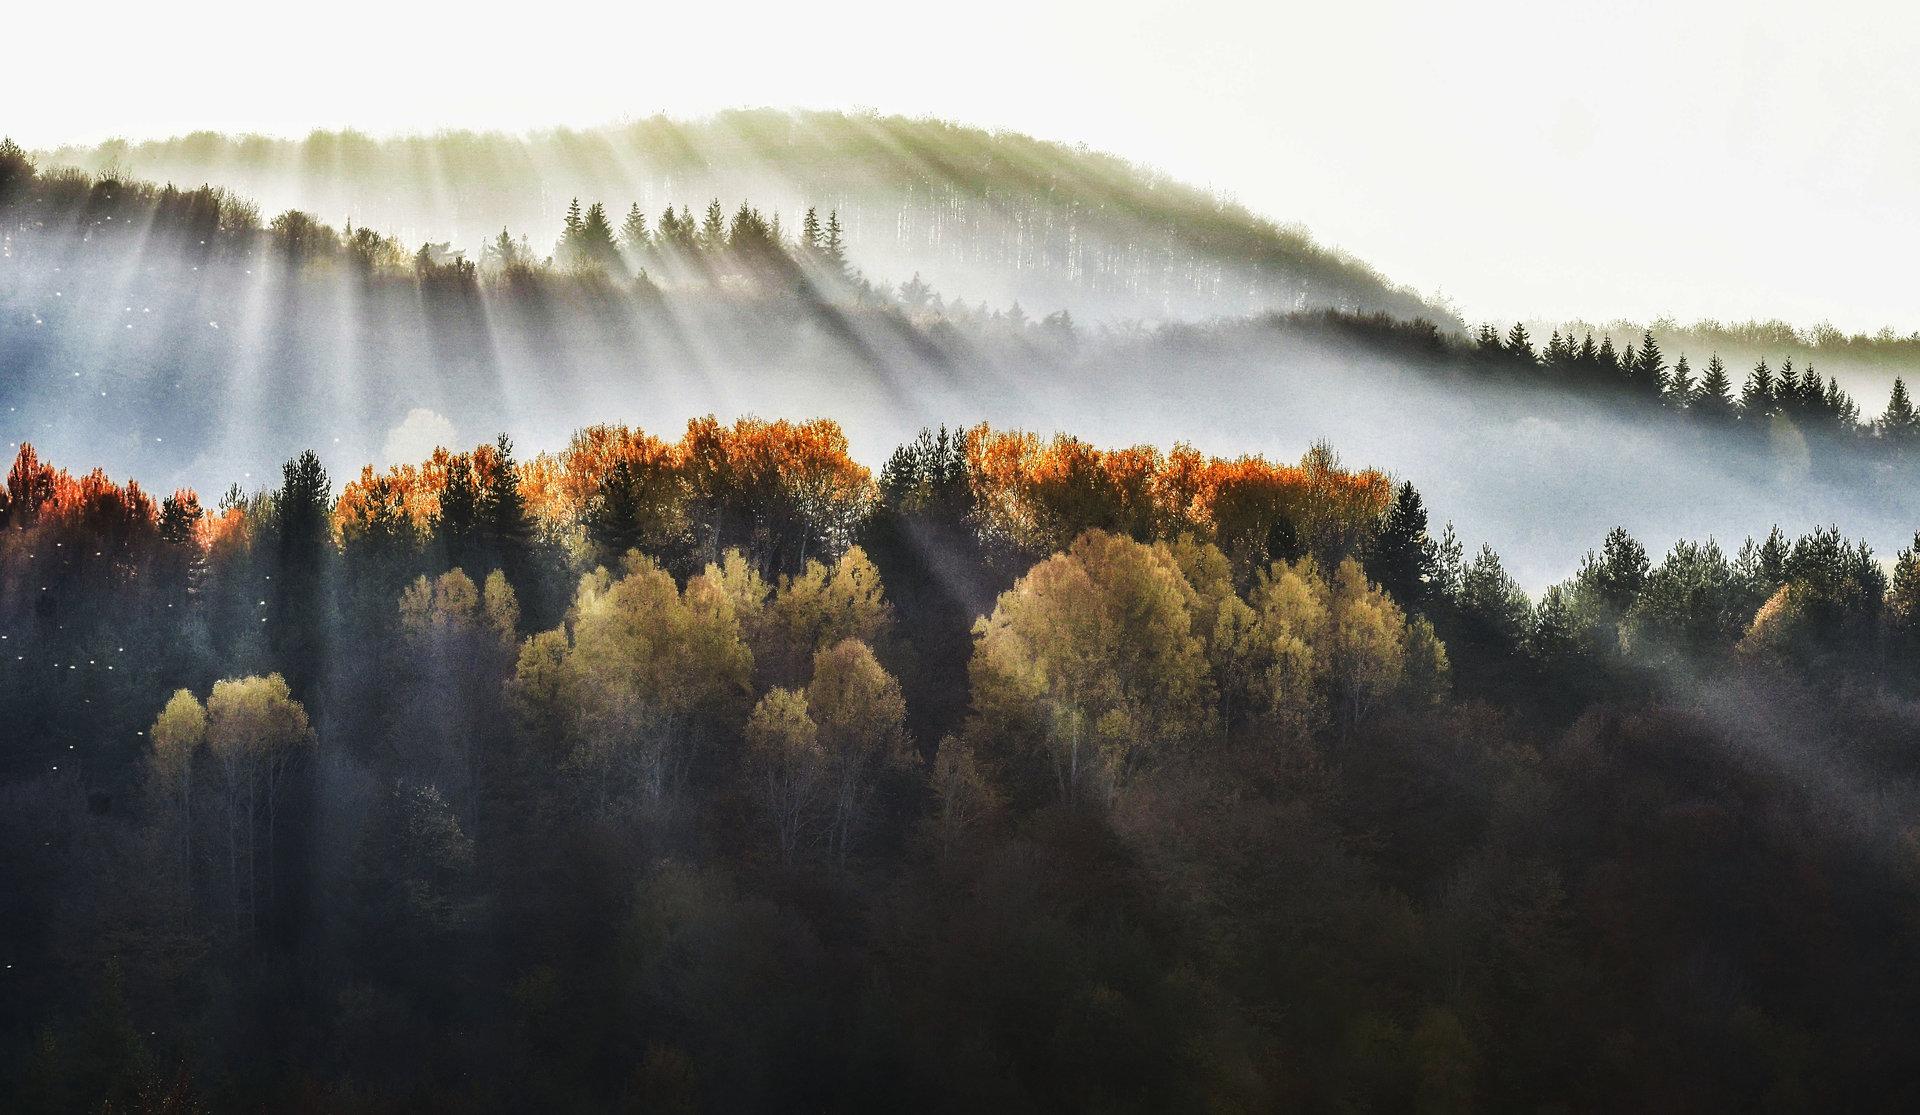 Photo in Nature | Author kolmik | PHOTO FORUM